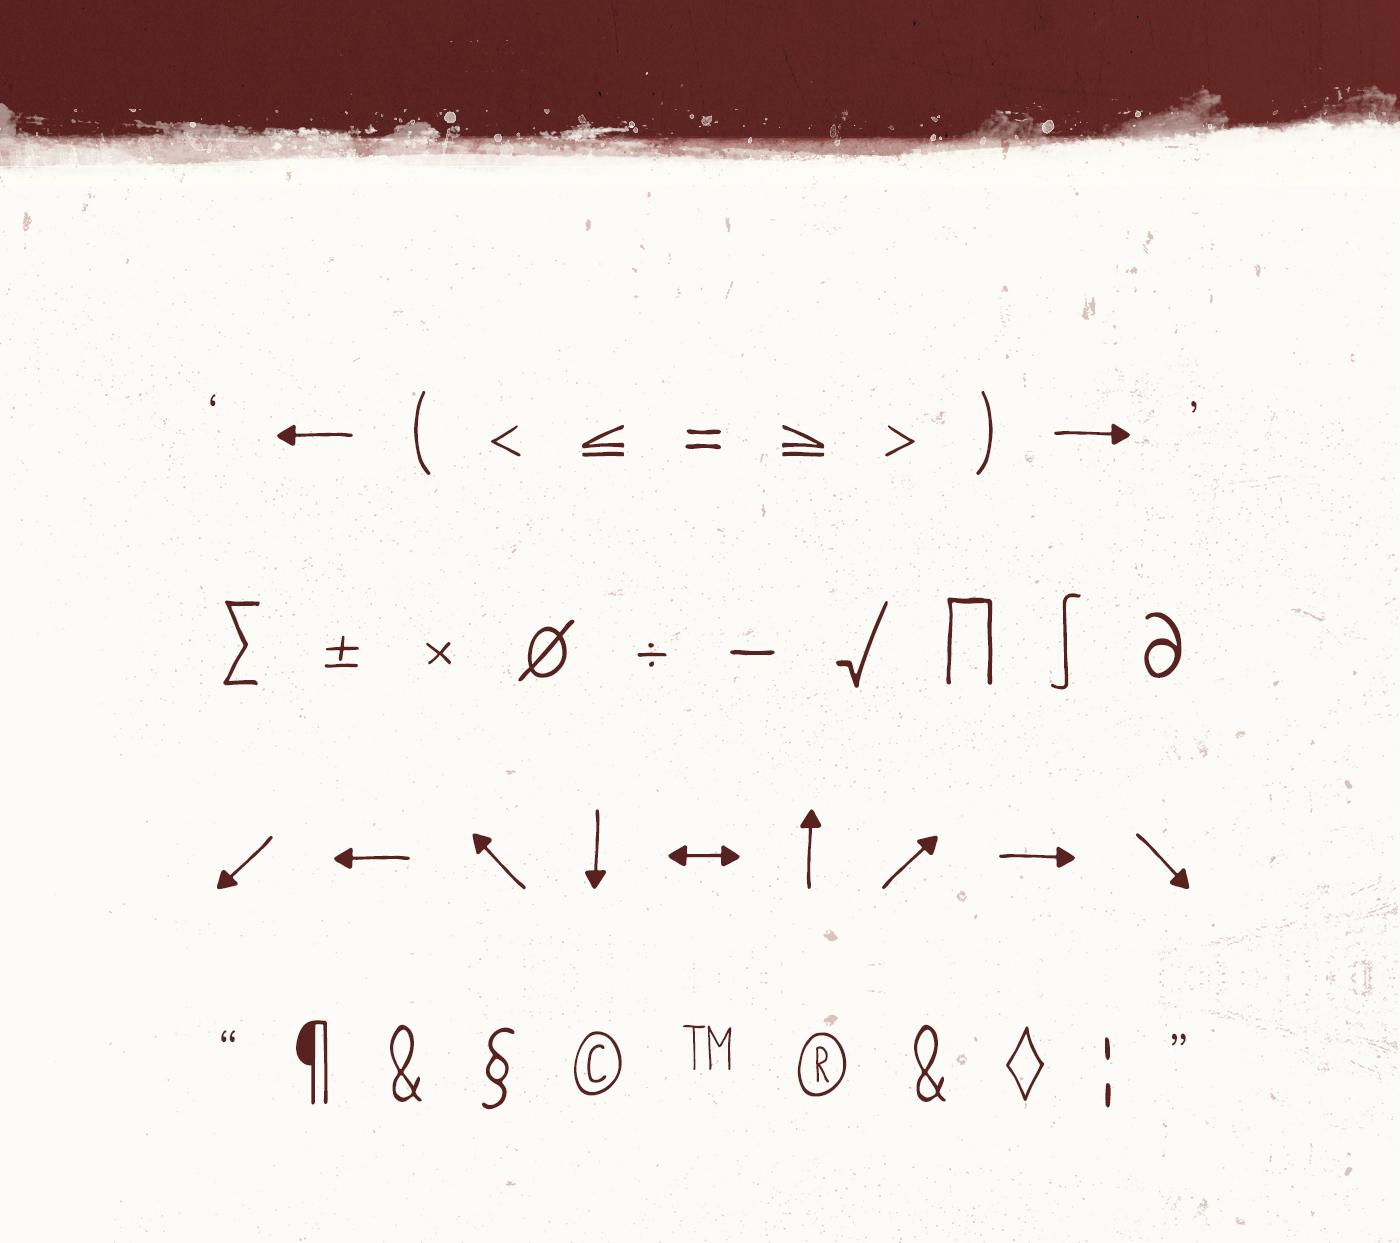 Adobe Portfolio,Free font,font design,hand writing font